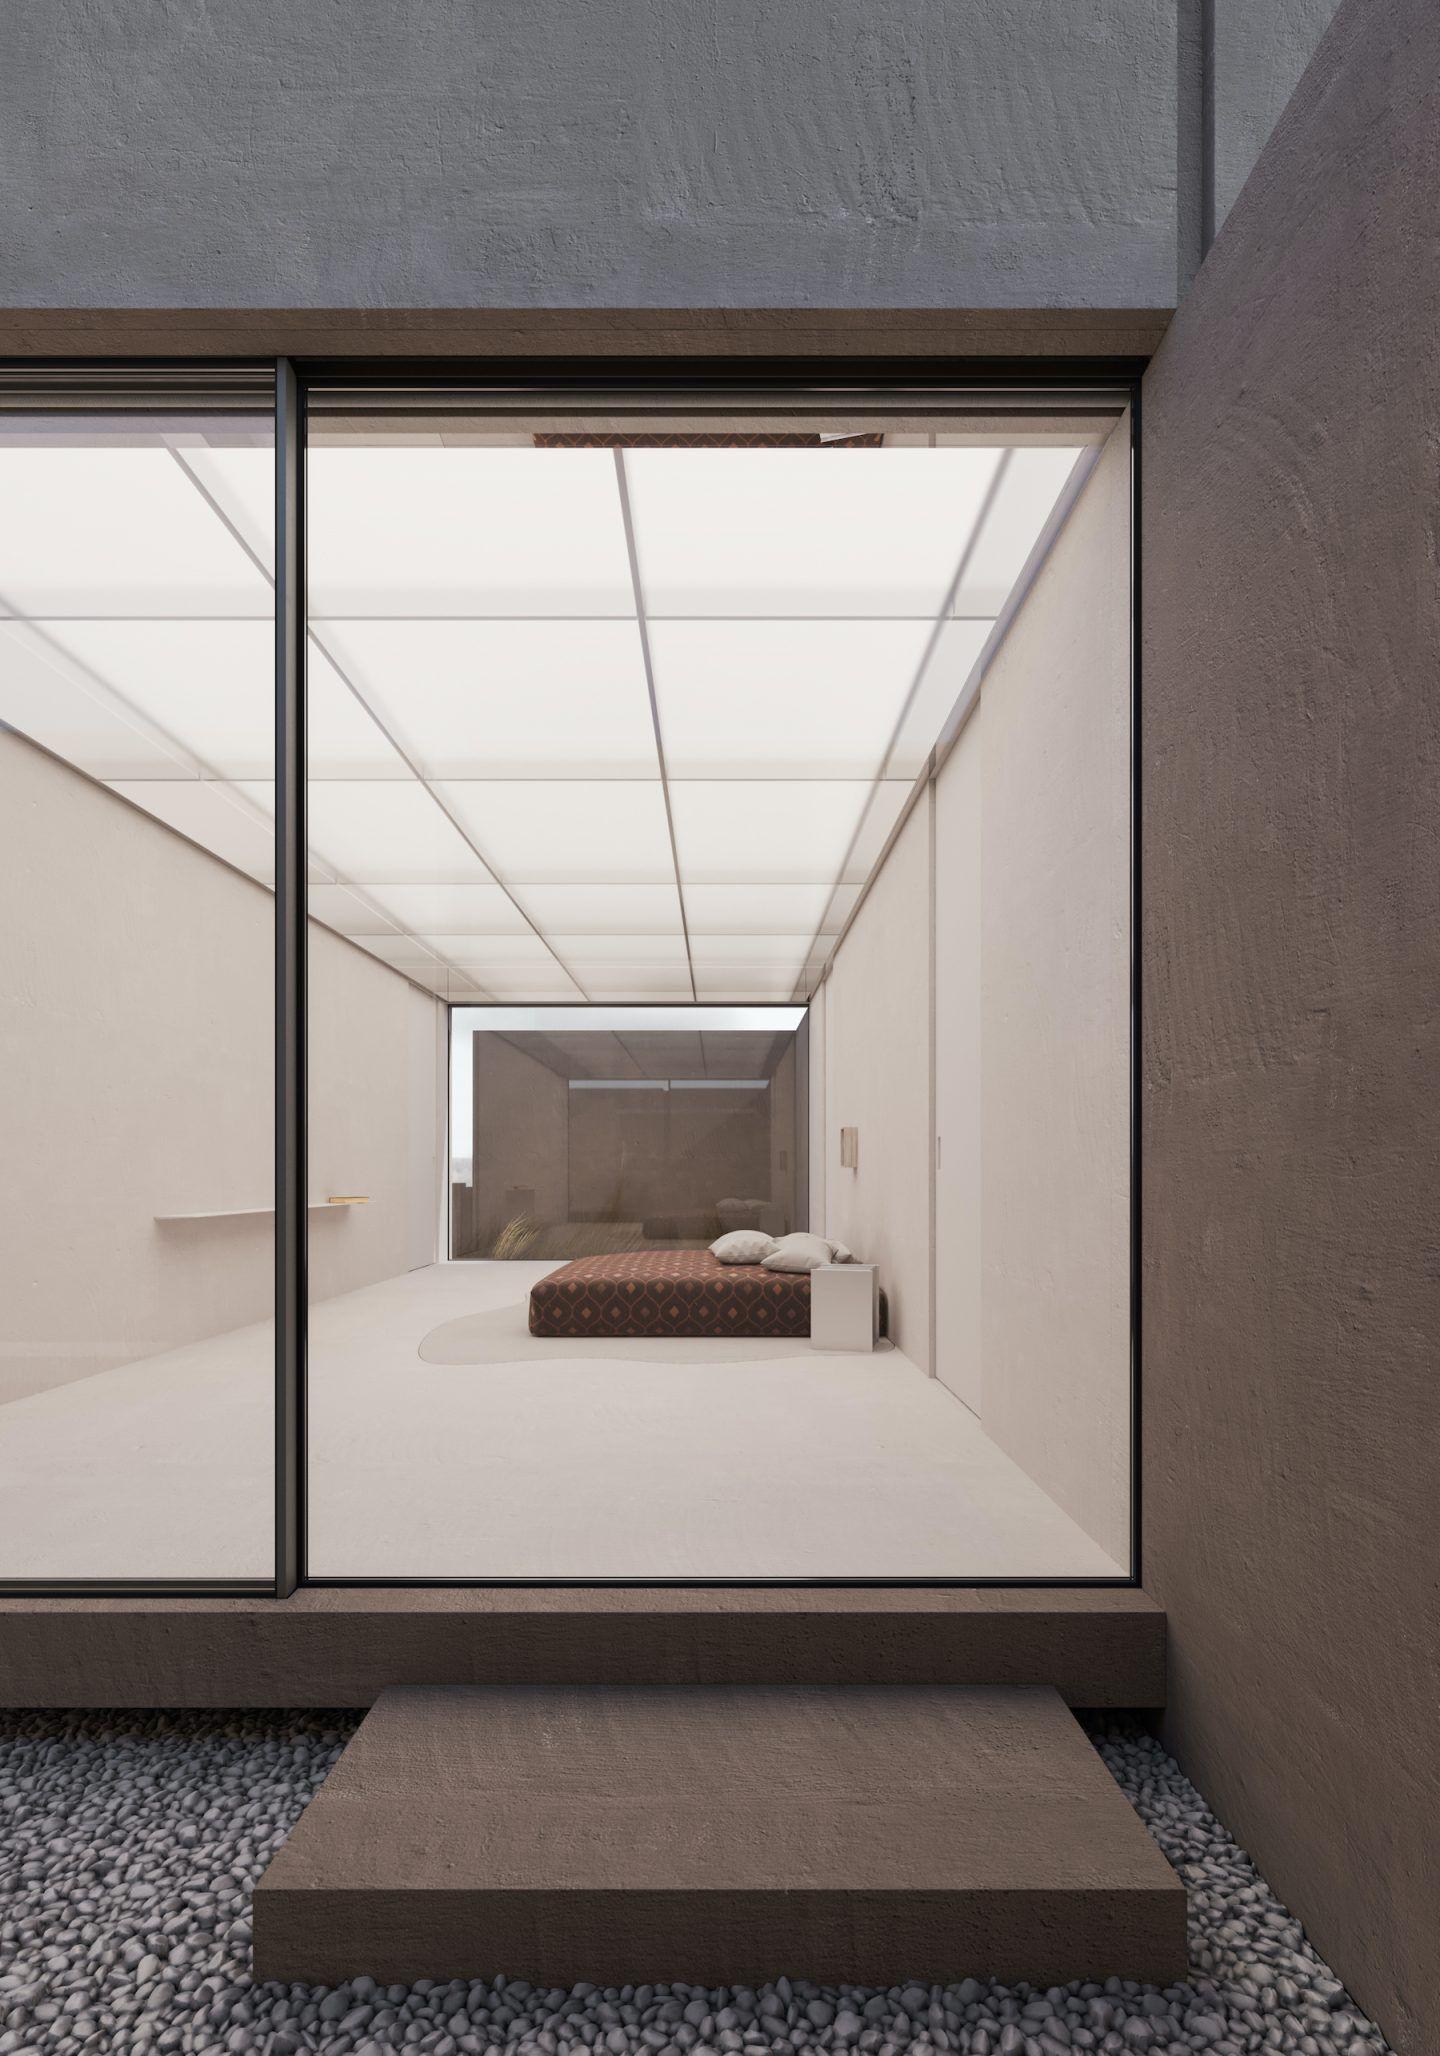 IGNANT-Design-Kanstantsin-Remez-II-Introvert-Residence-017